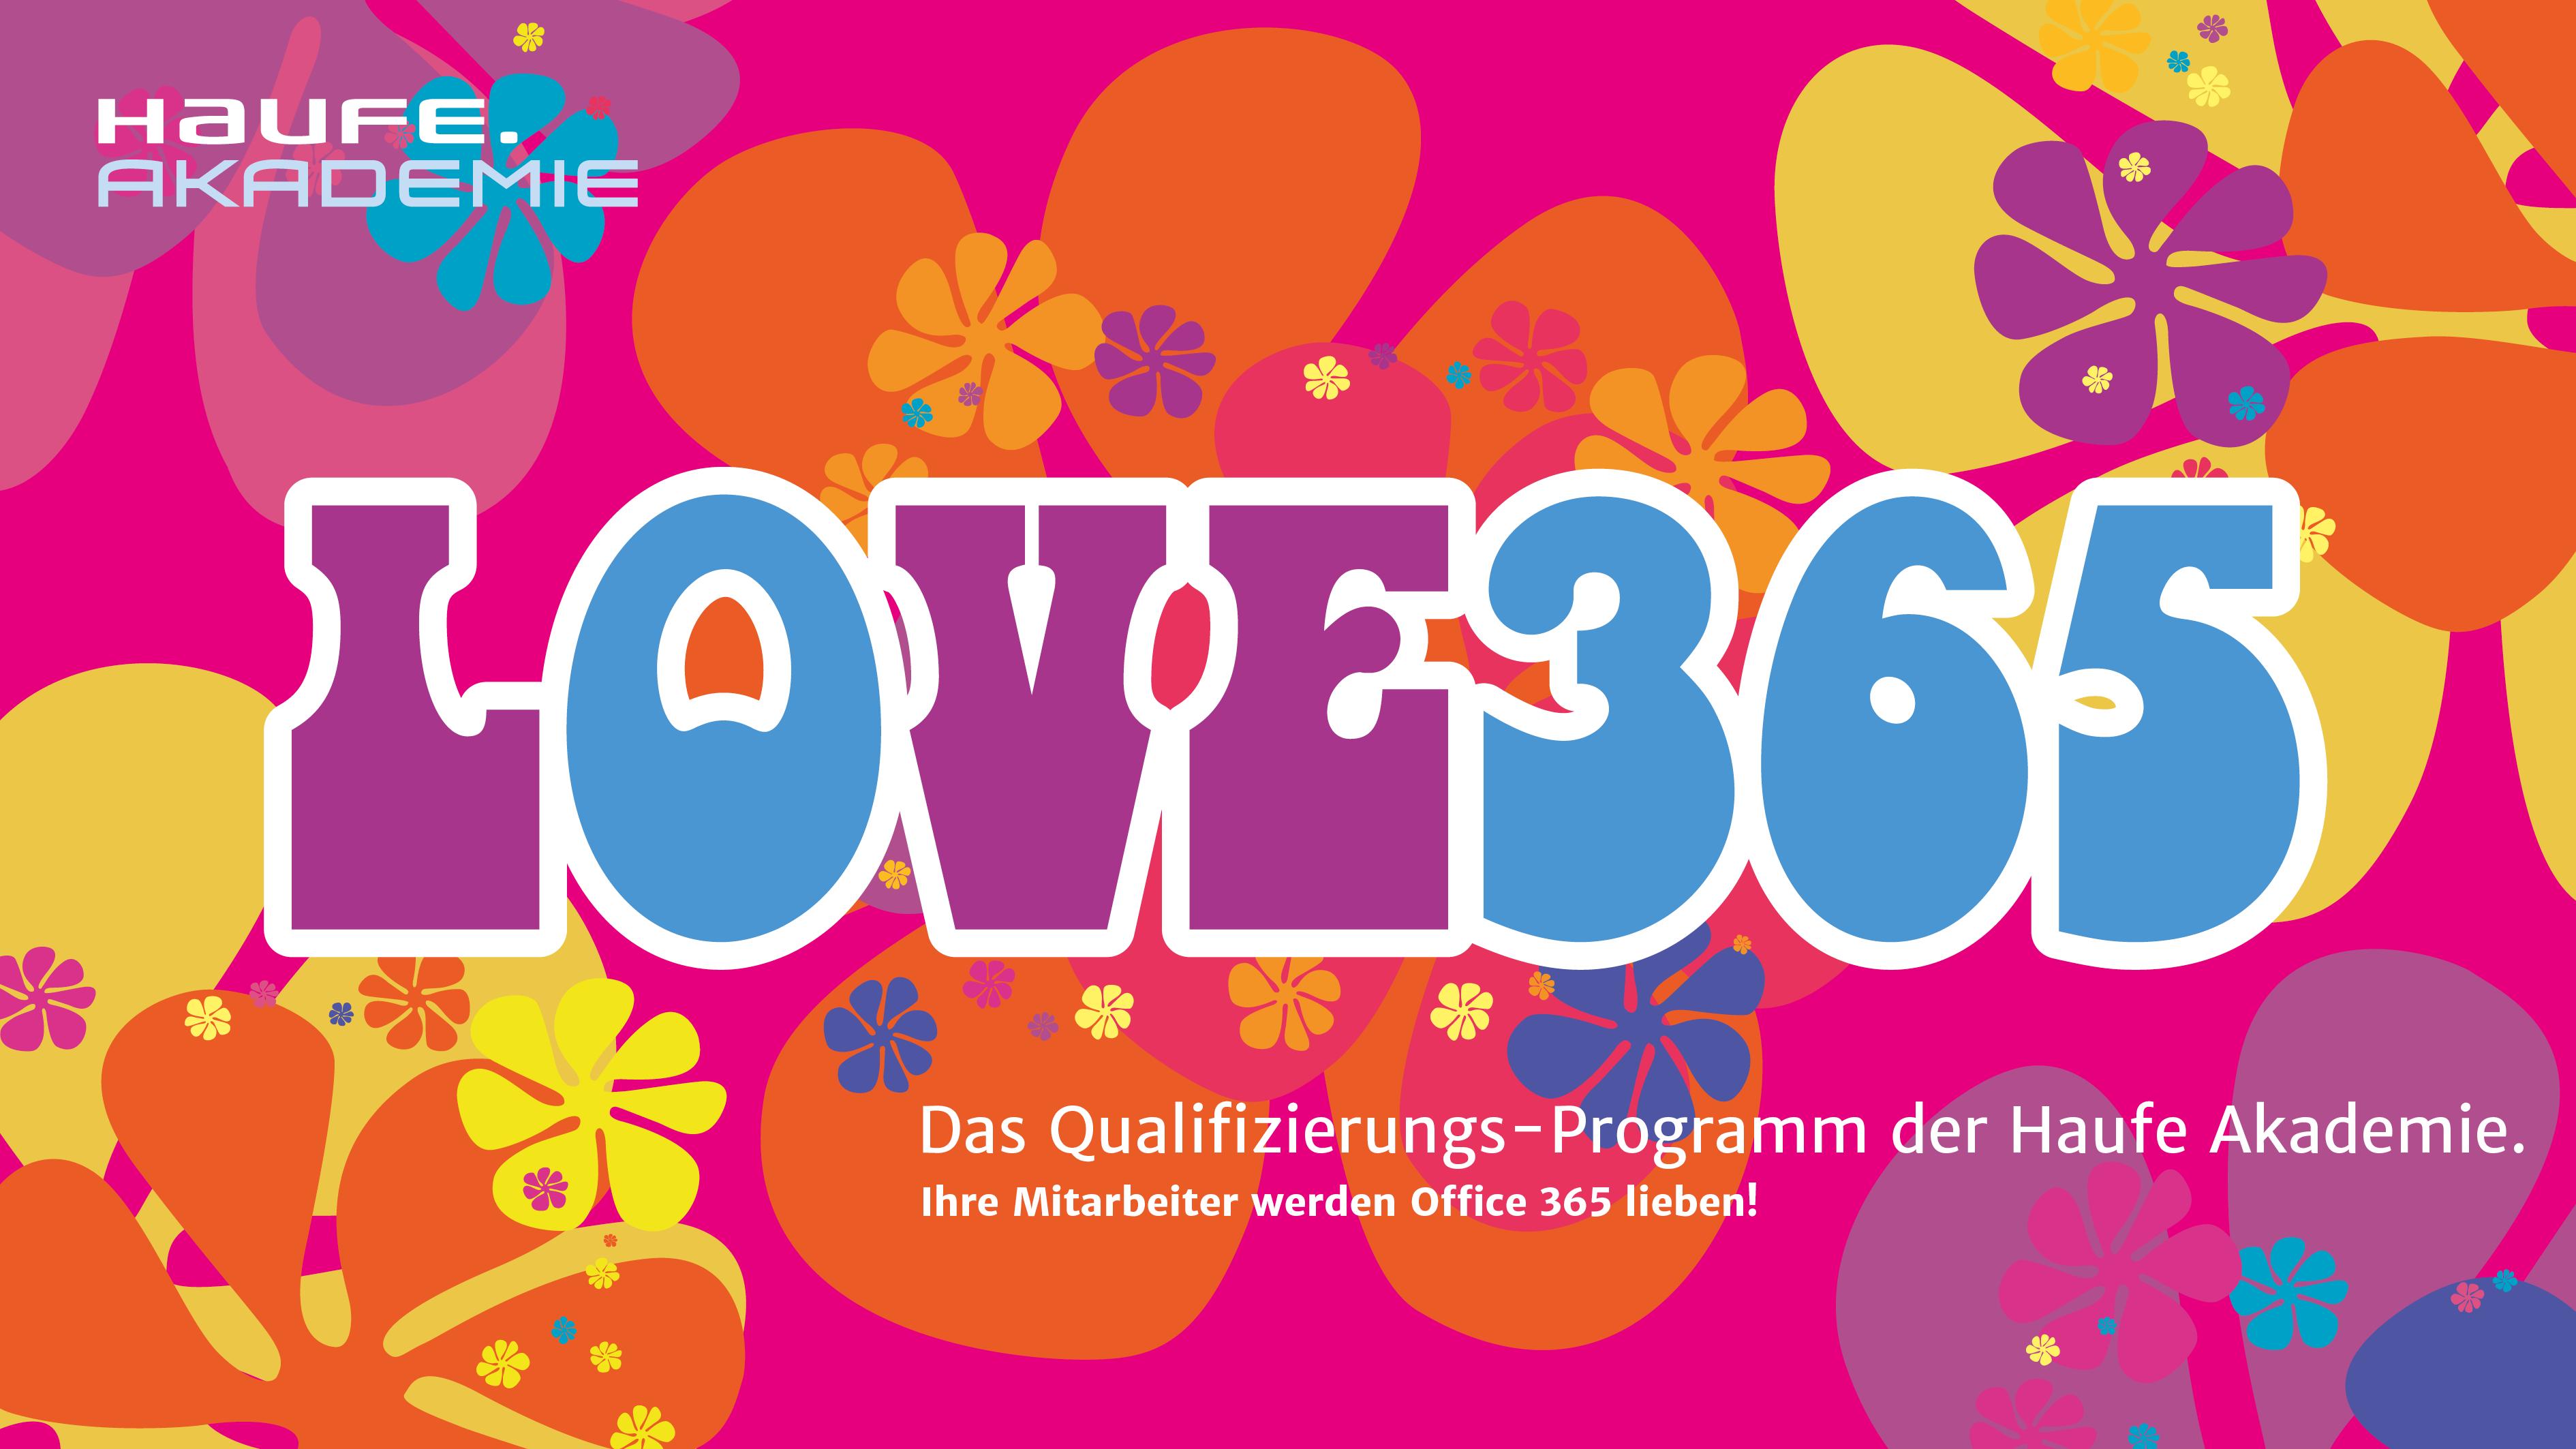 Haufe-Akademie - Love365-Key Visual